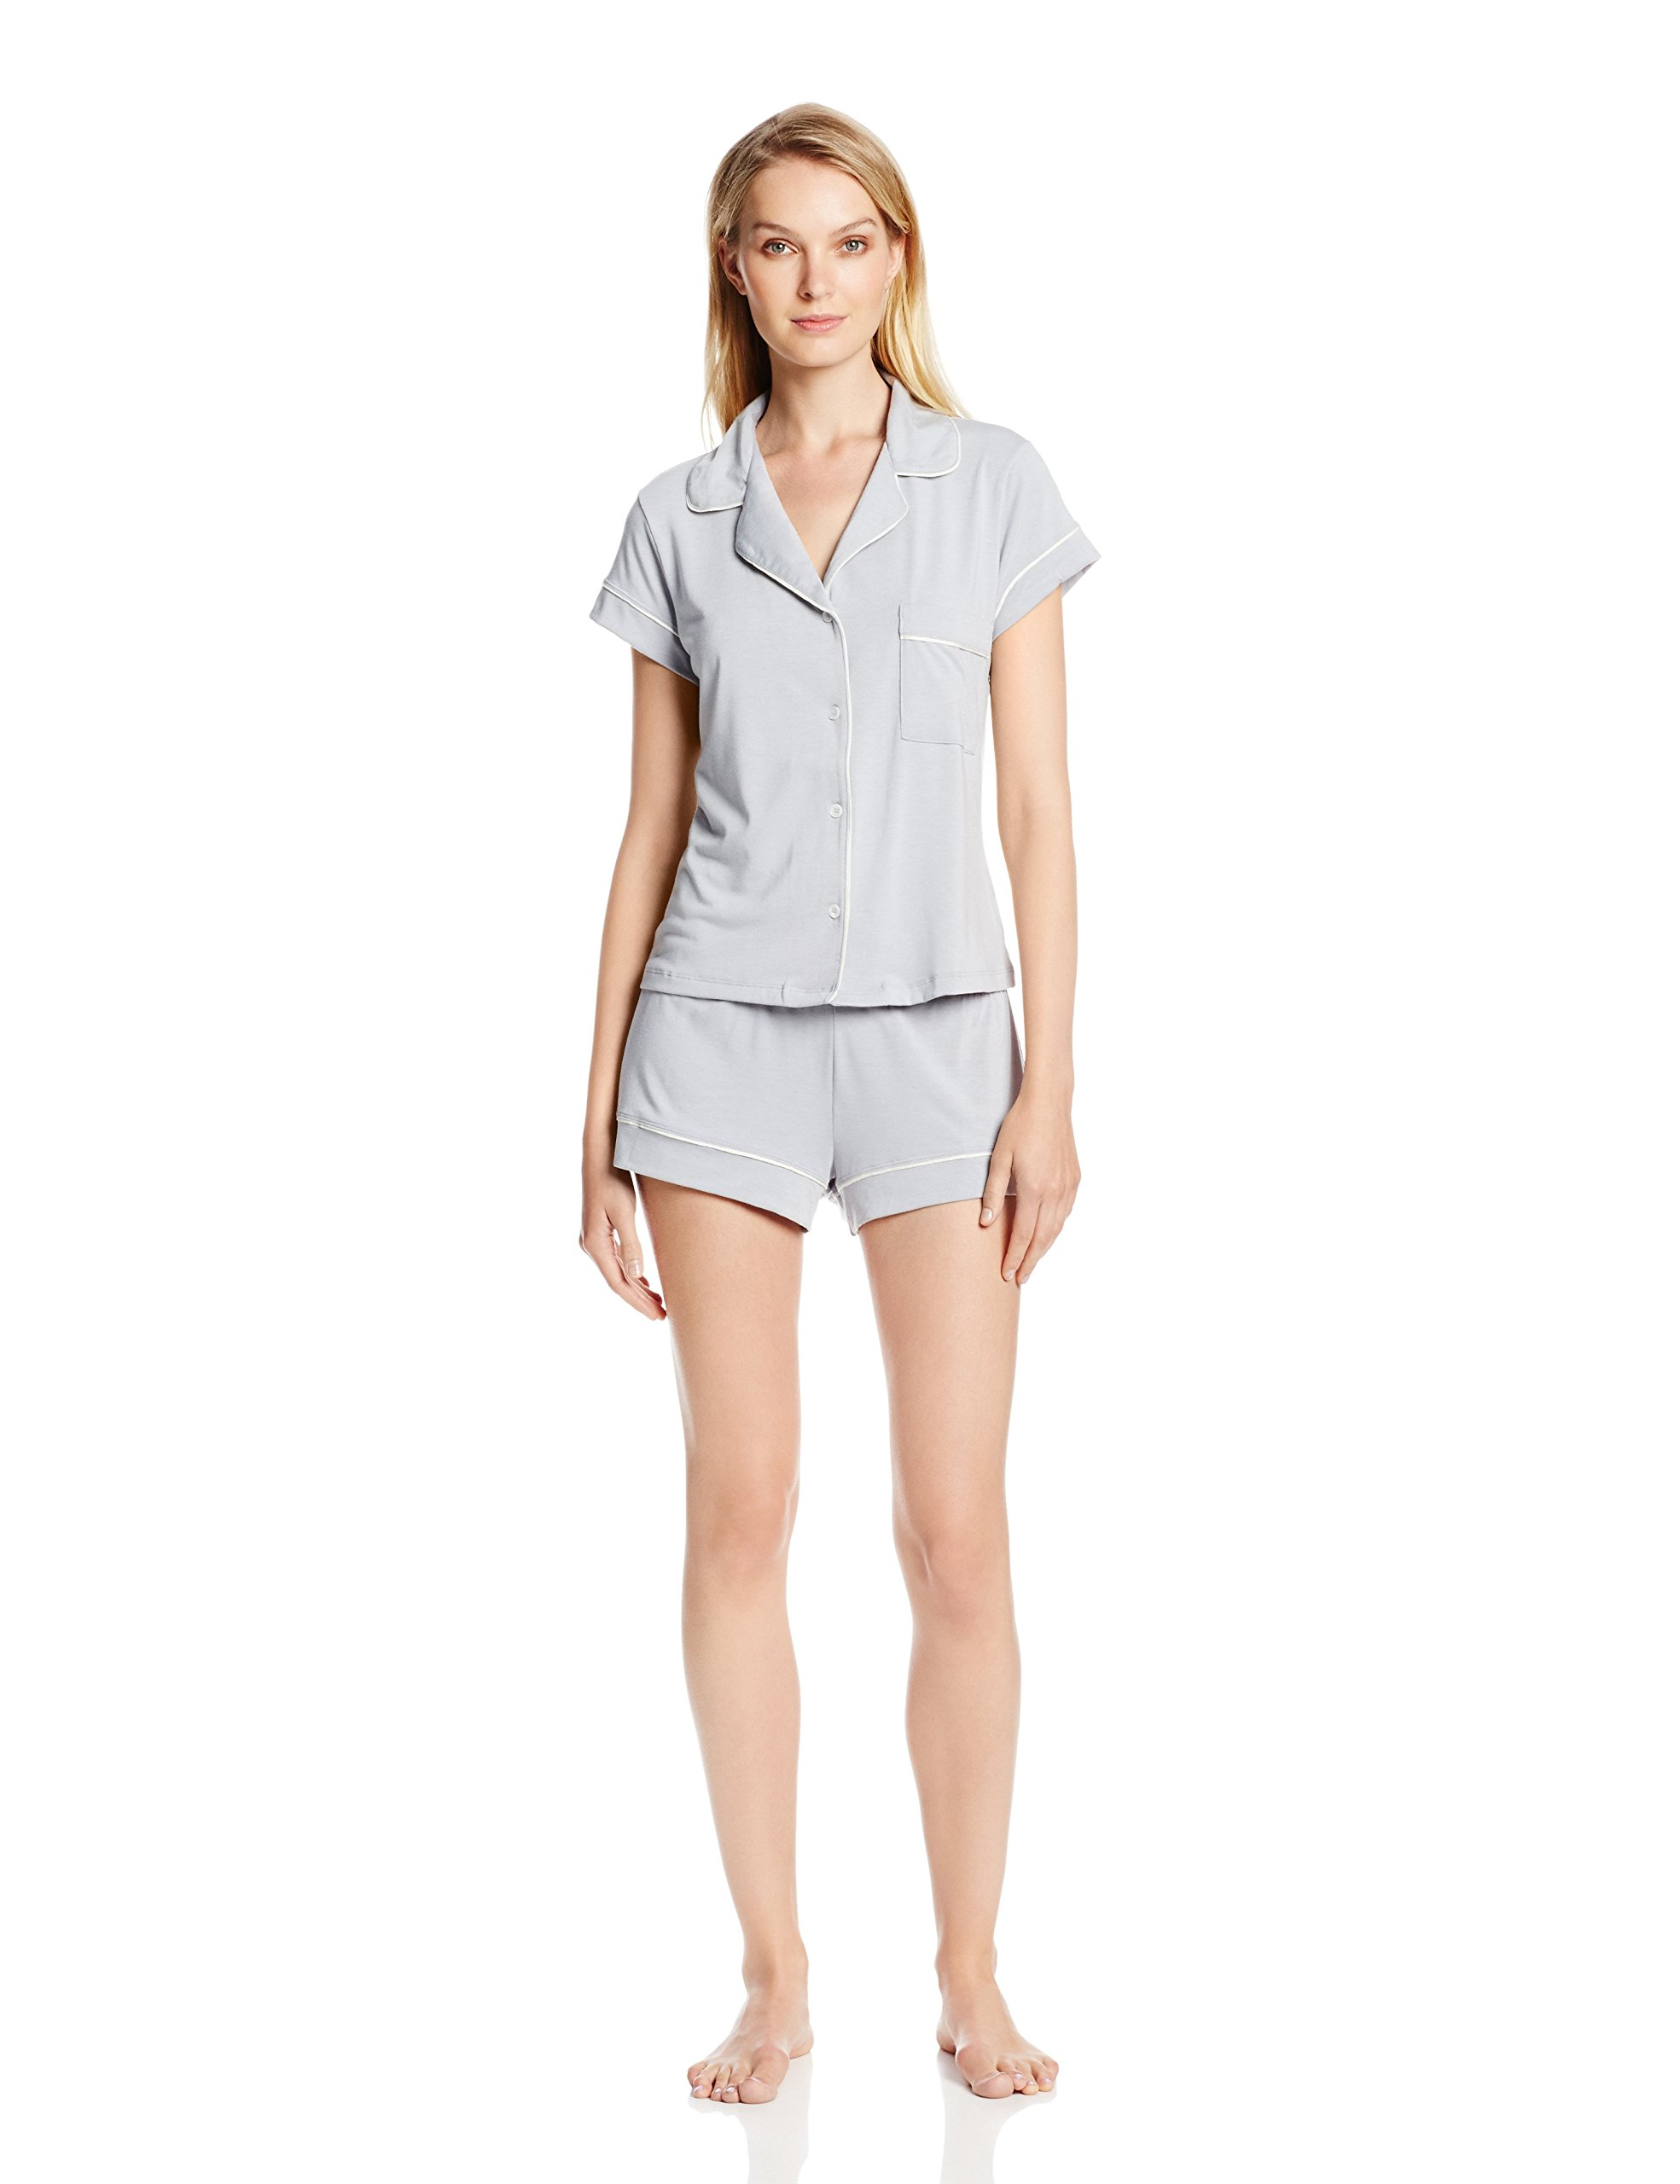 Eberjey Women's Gisele Short Pajama Set, Water Blue, Small